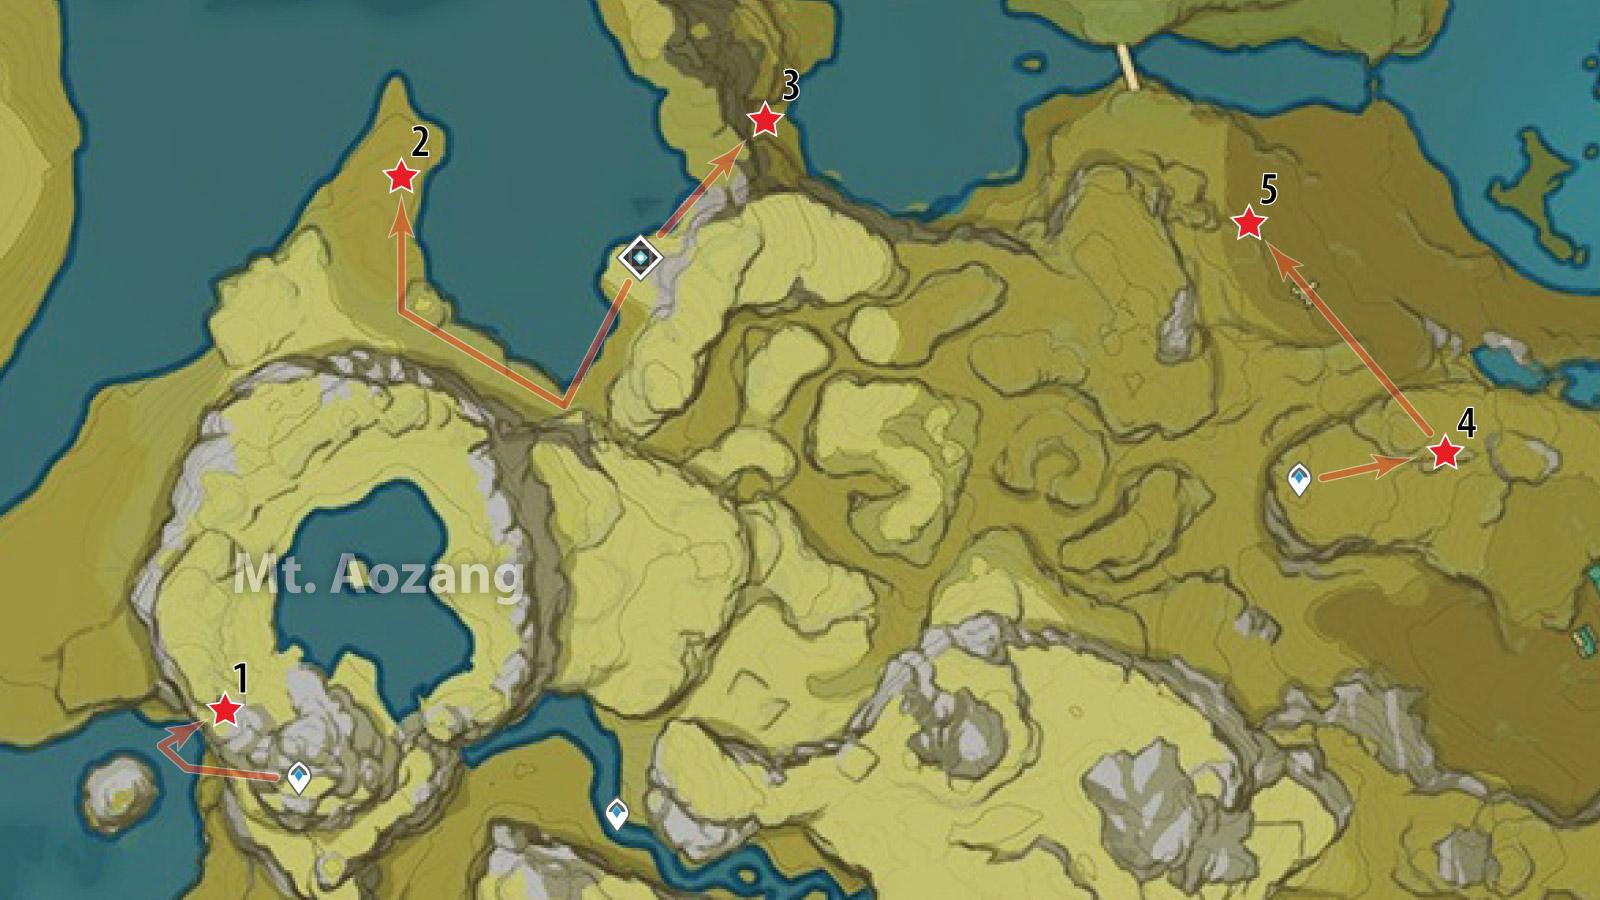 genshin impact crystal chunk map